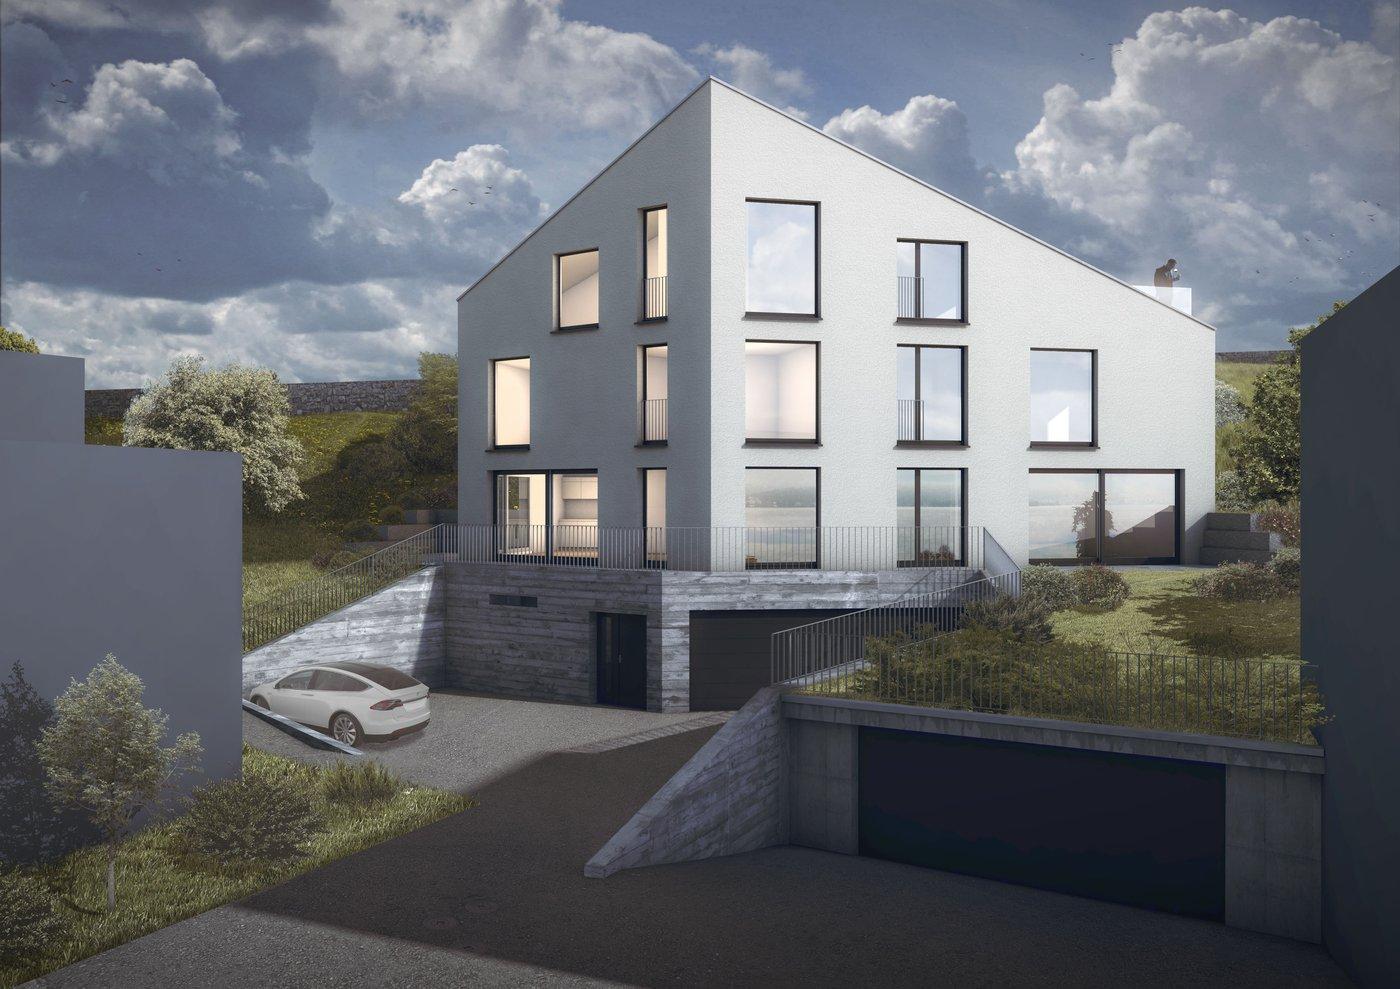 Modernes doppeleinfamilienhaus in 8713 uerikon zh